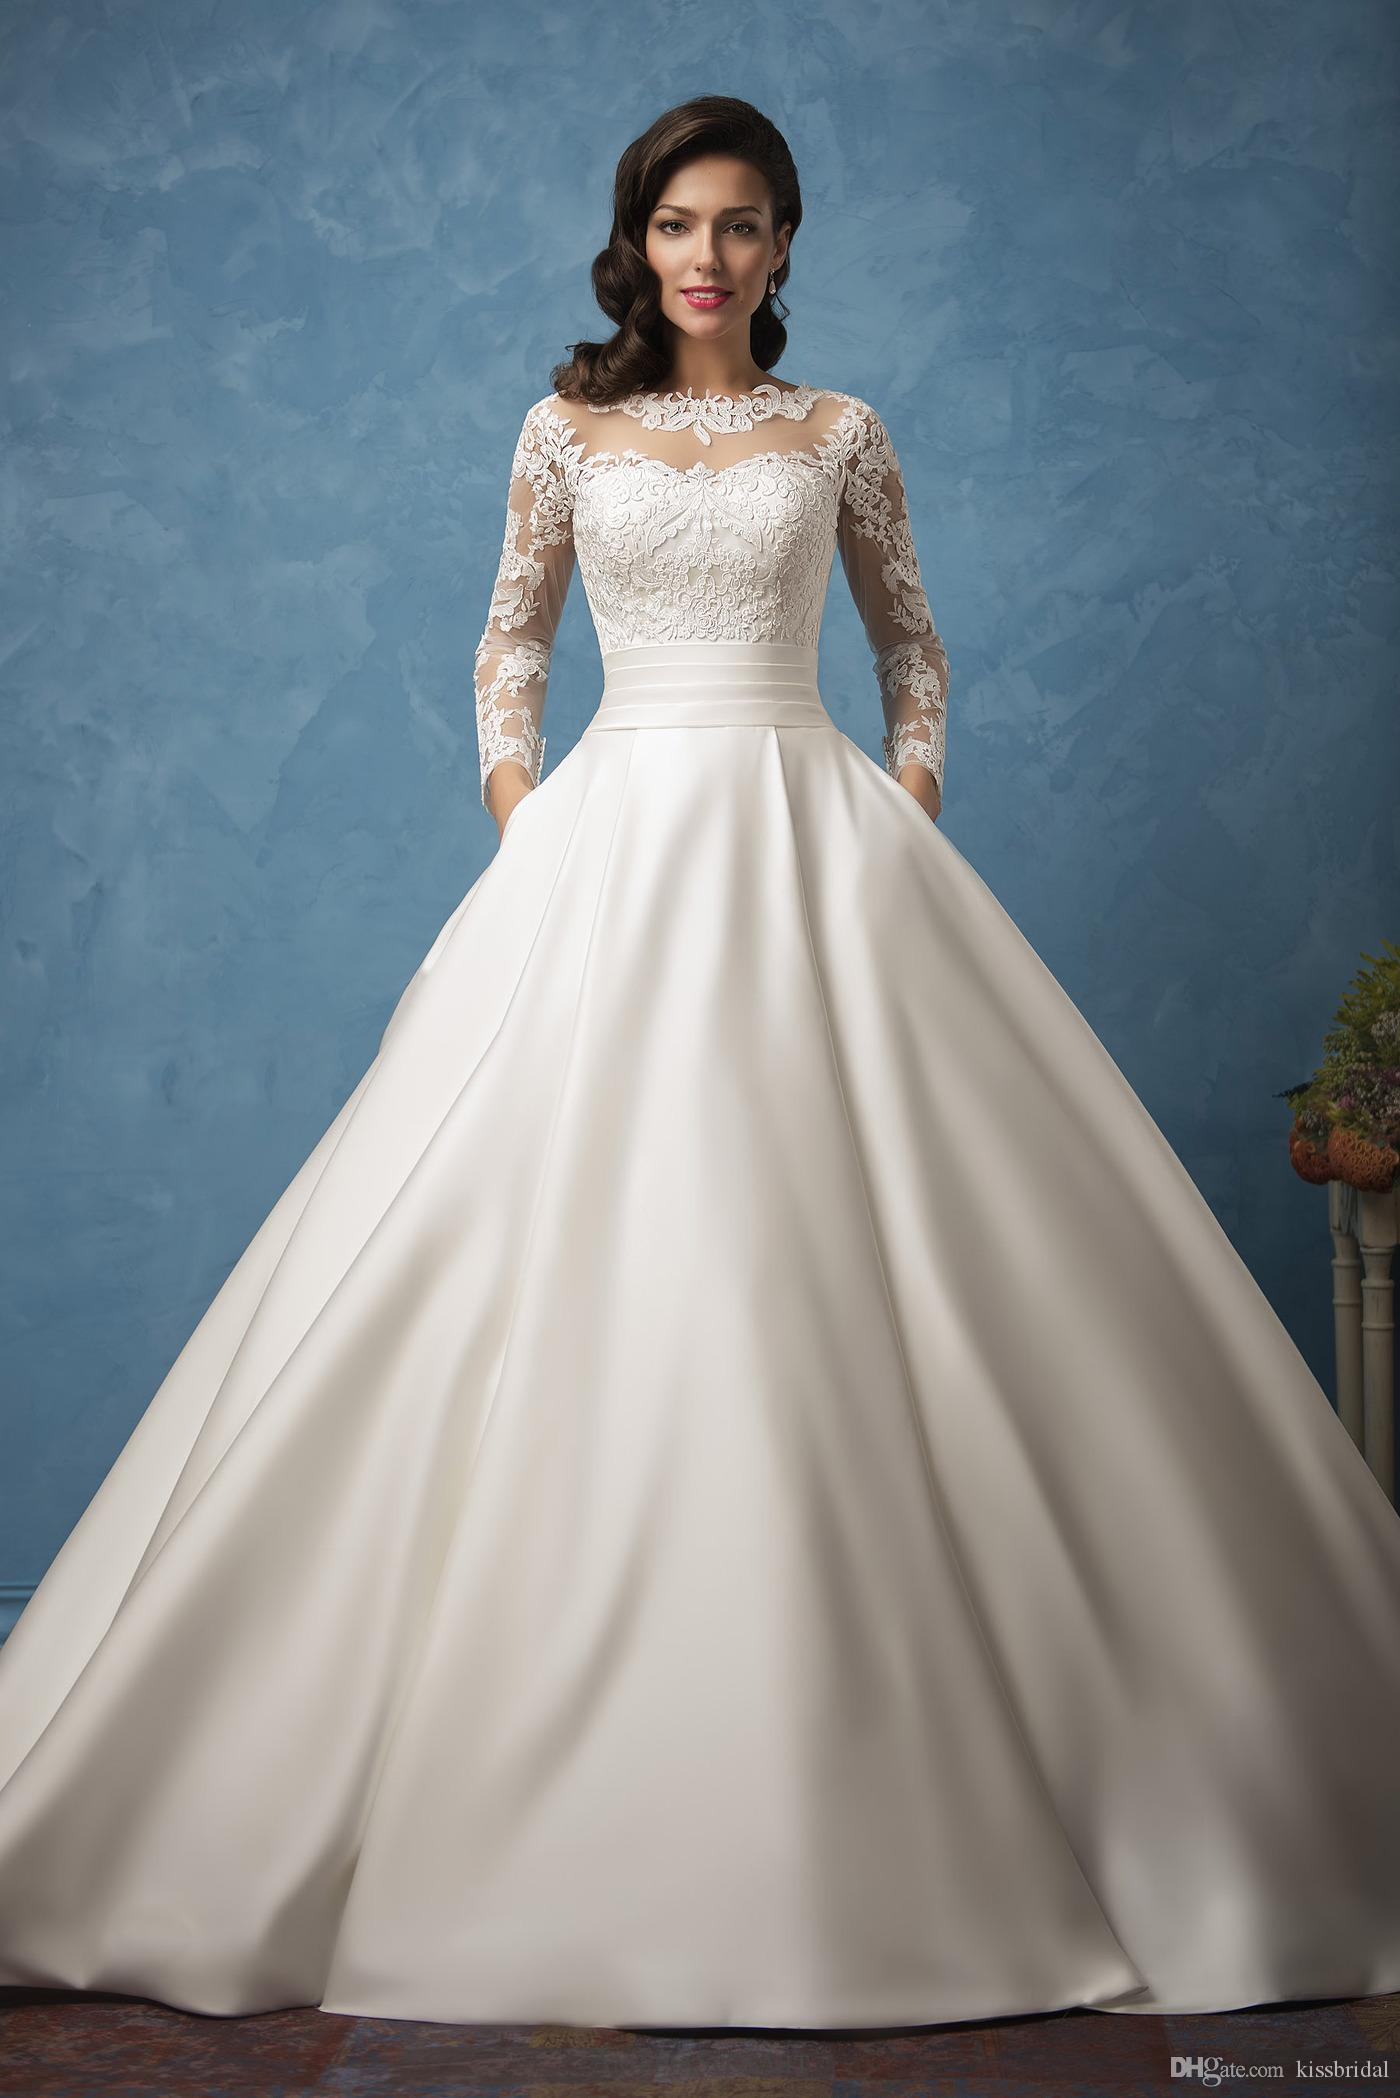 long sleeve ball gown wedding dresses 2019 elegant sheer